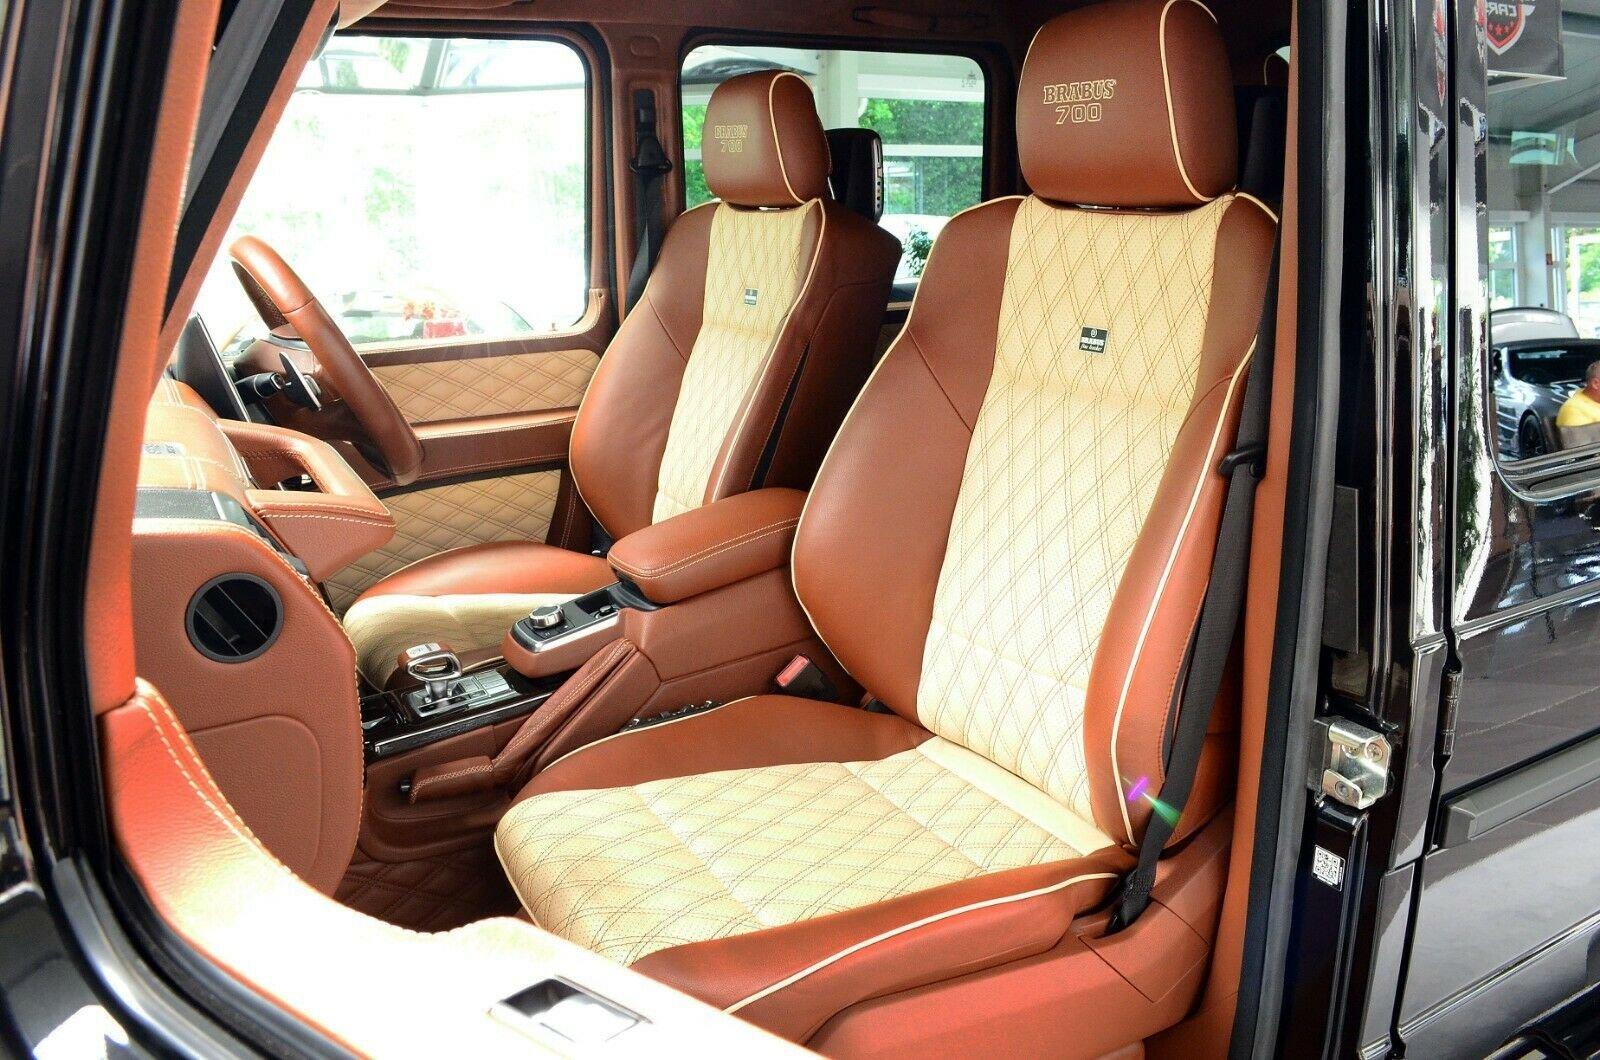 Mercedes-Benz G 63 AMG 6x6 Brabus700 - 1of15 (11)